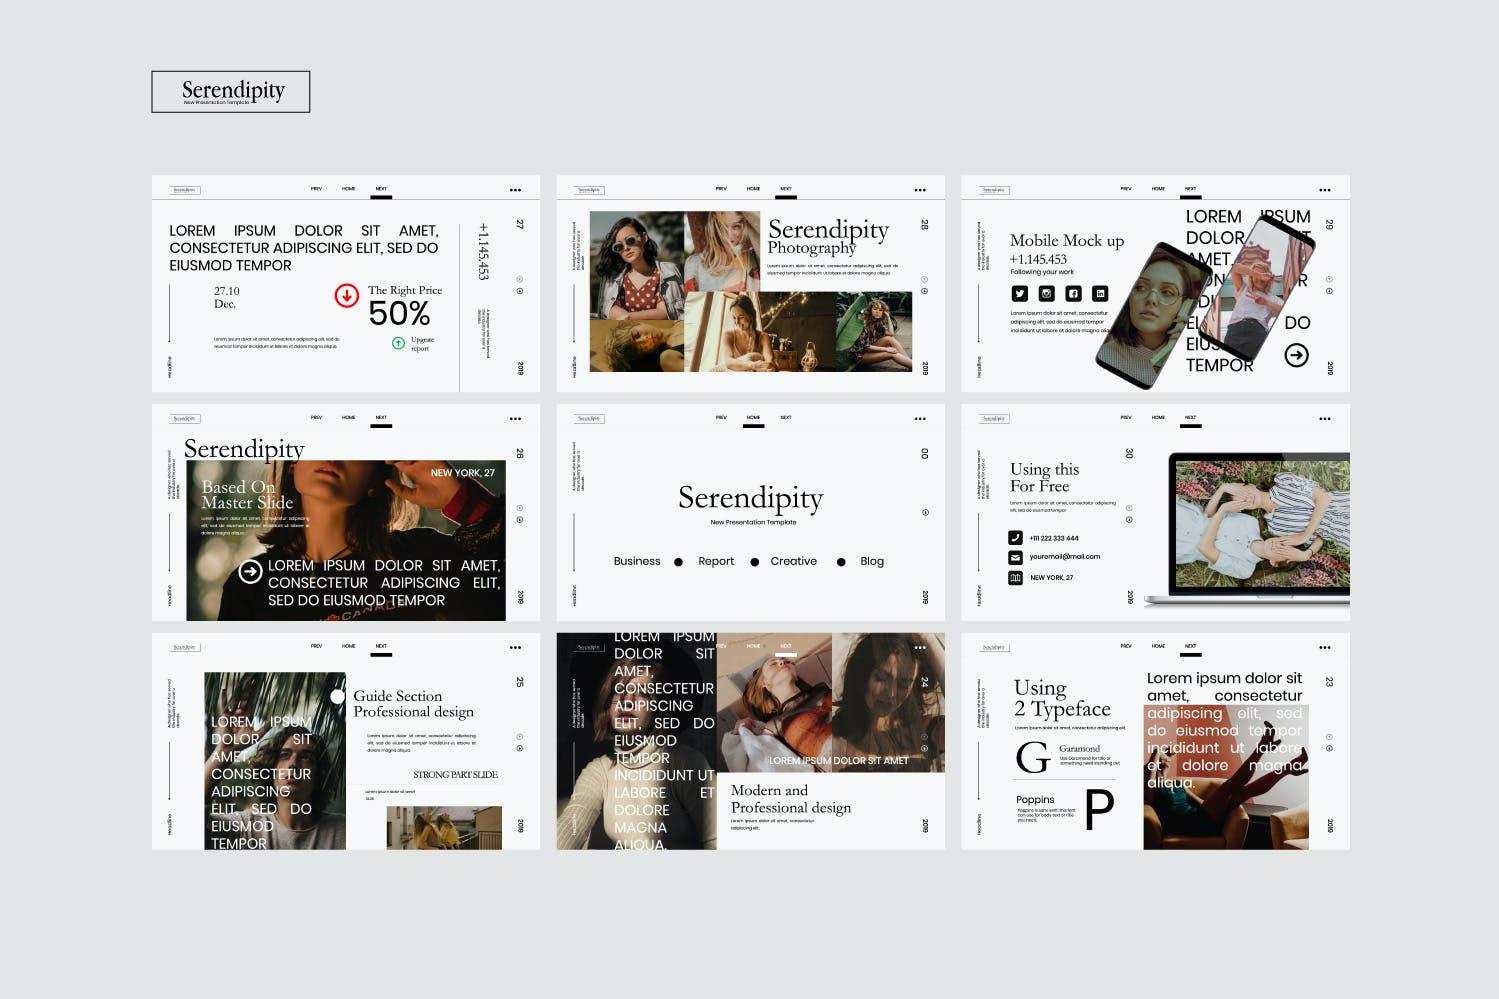 时尚简约服装摄影作品集幻灯片设计模板 Serendipity – Modern Fashion Design Powerpoint插图(8)